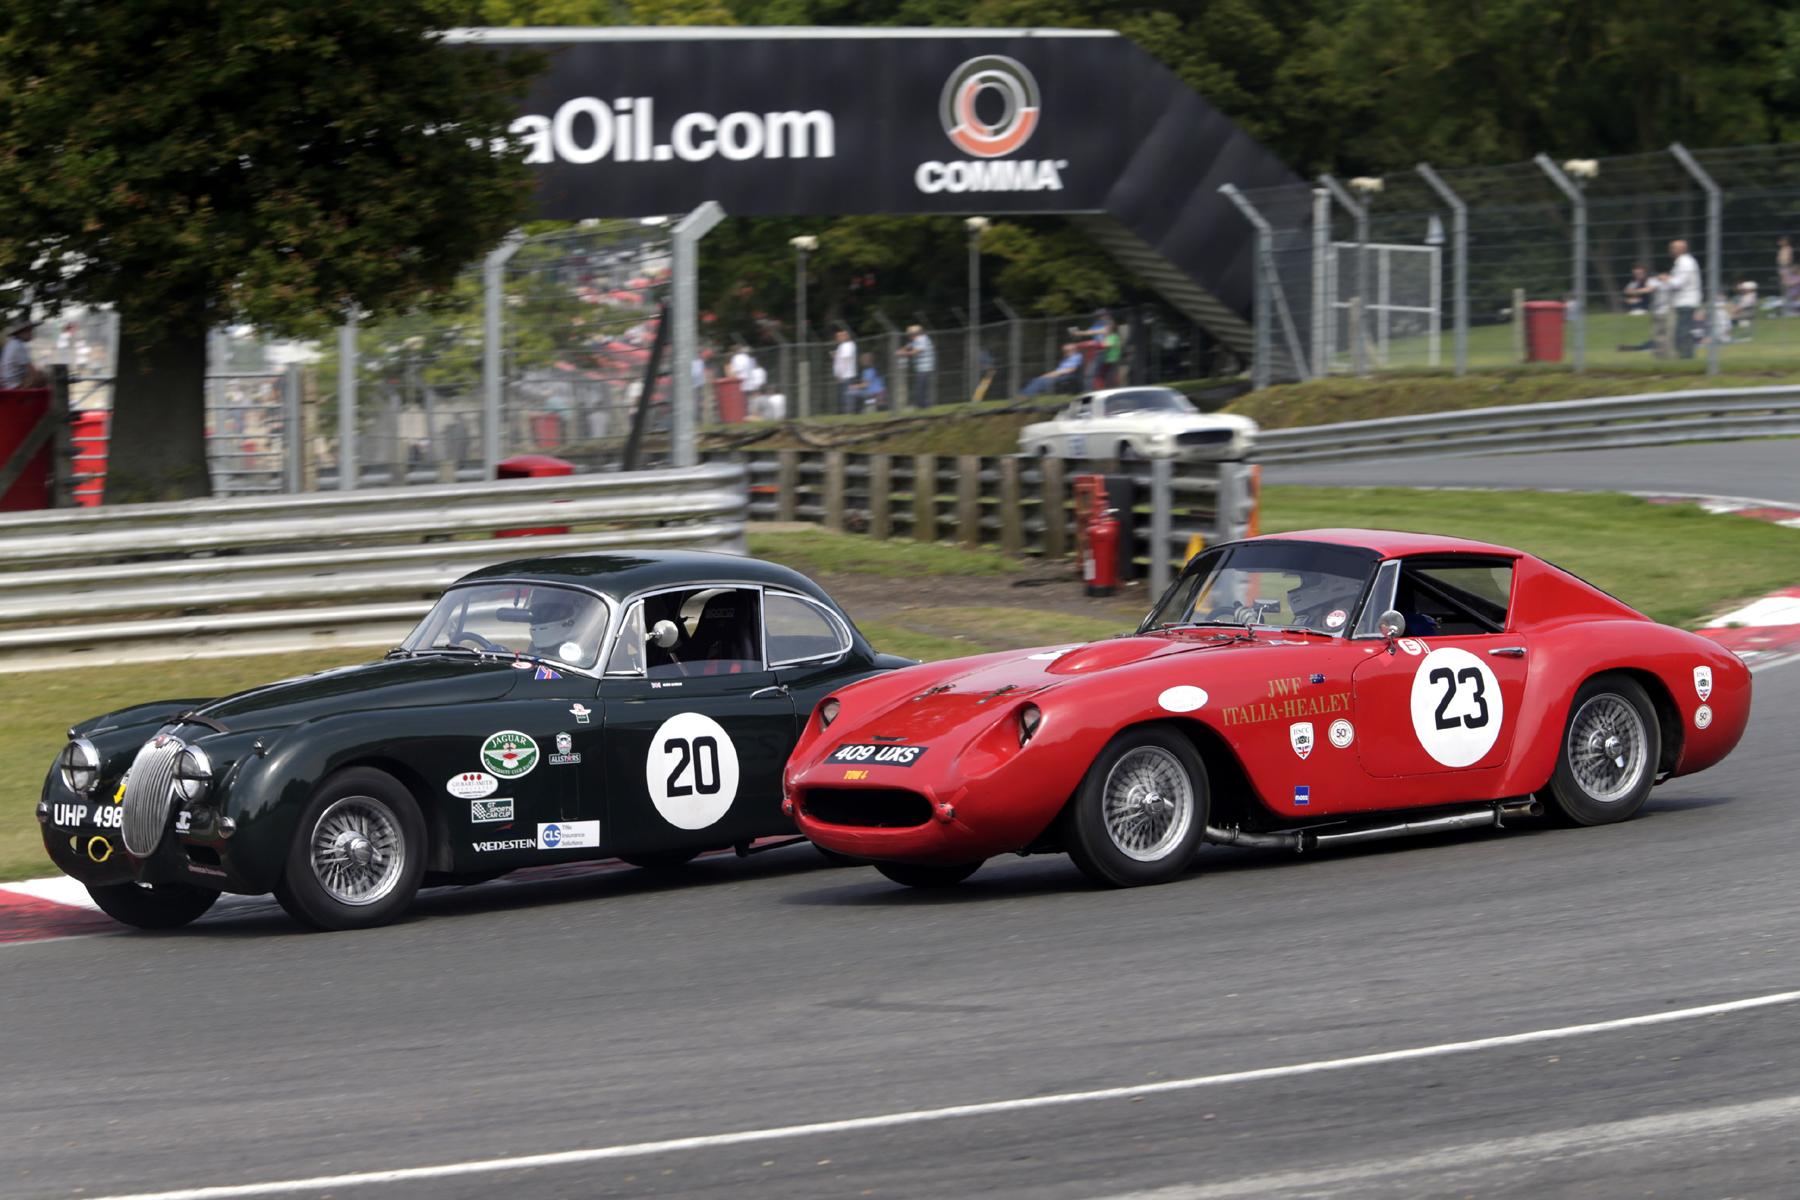 Marc Gordon and Daniel Wood                                                    Photo - Gary Hawkins